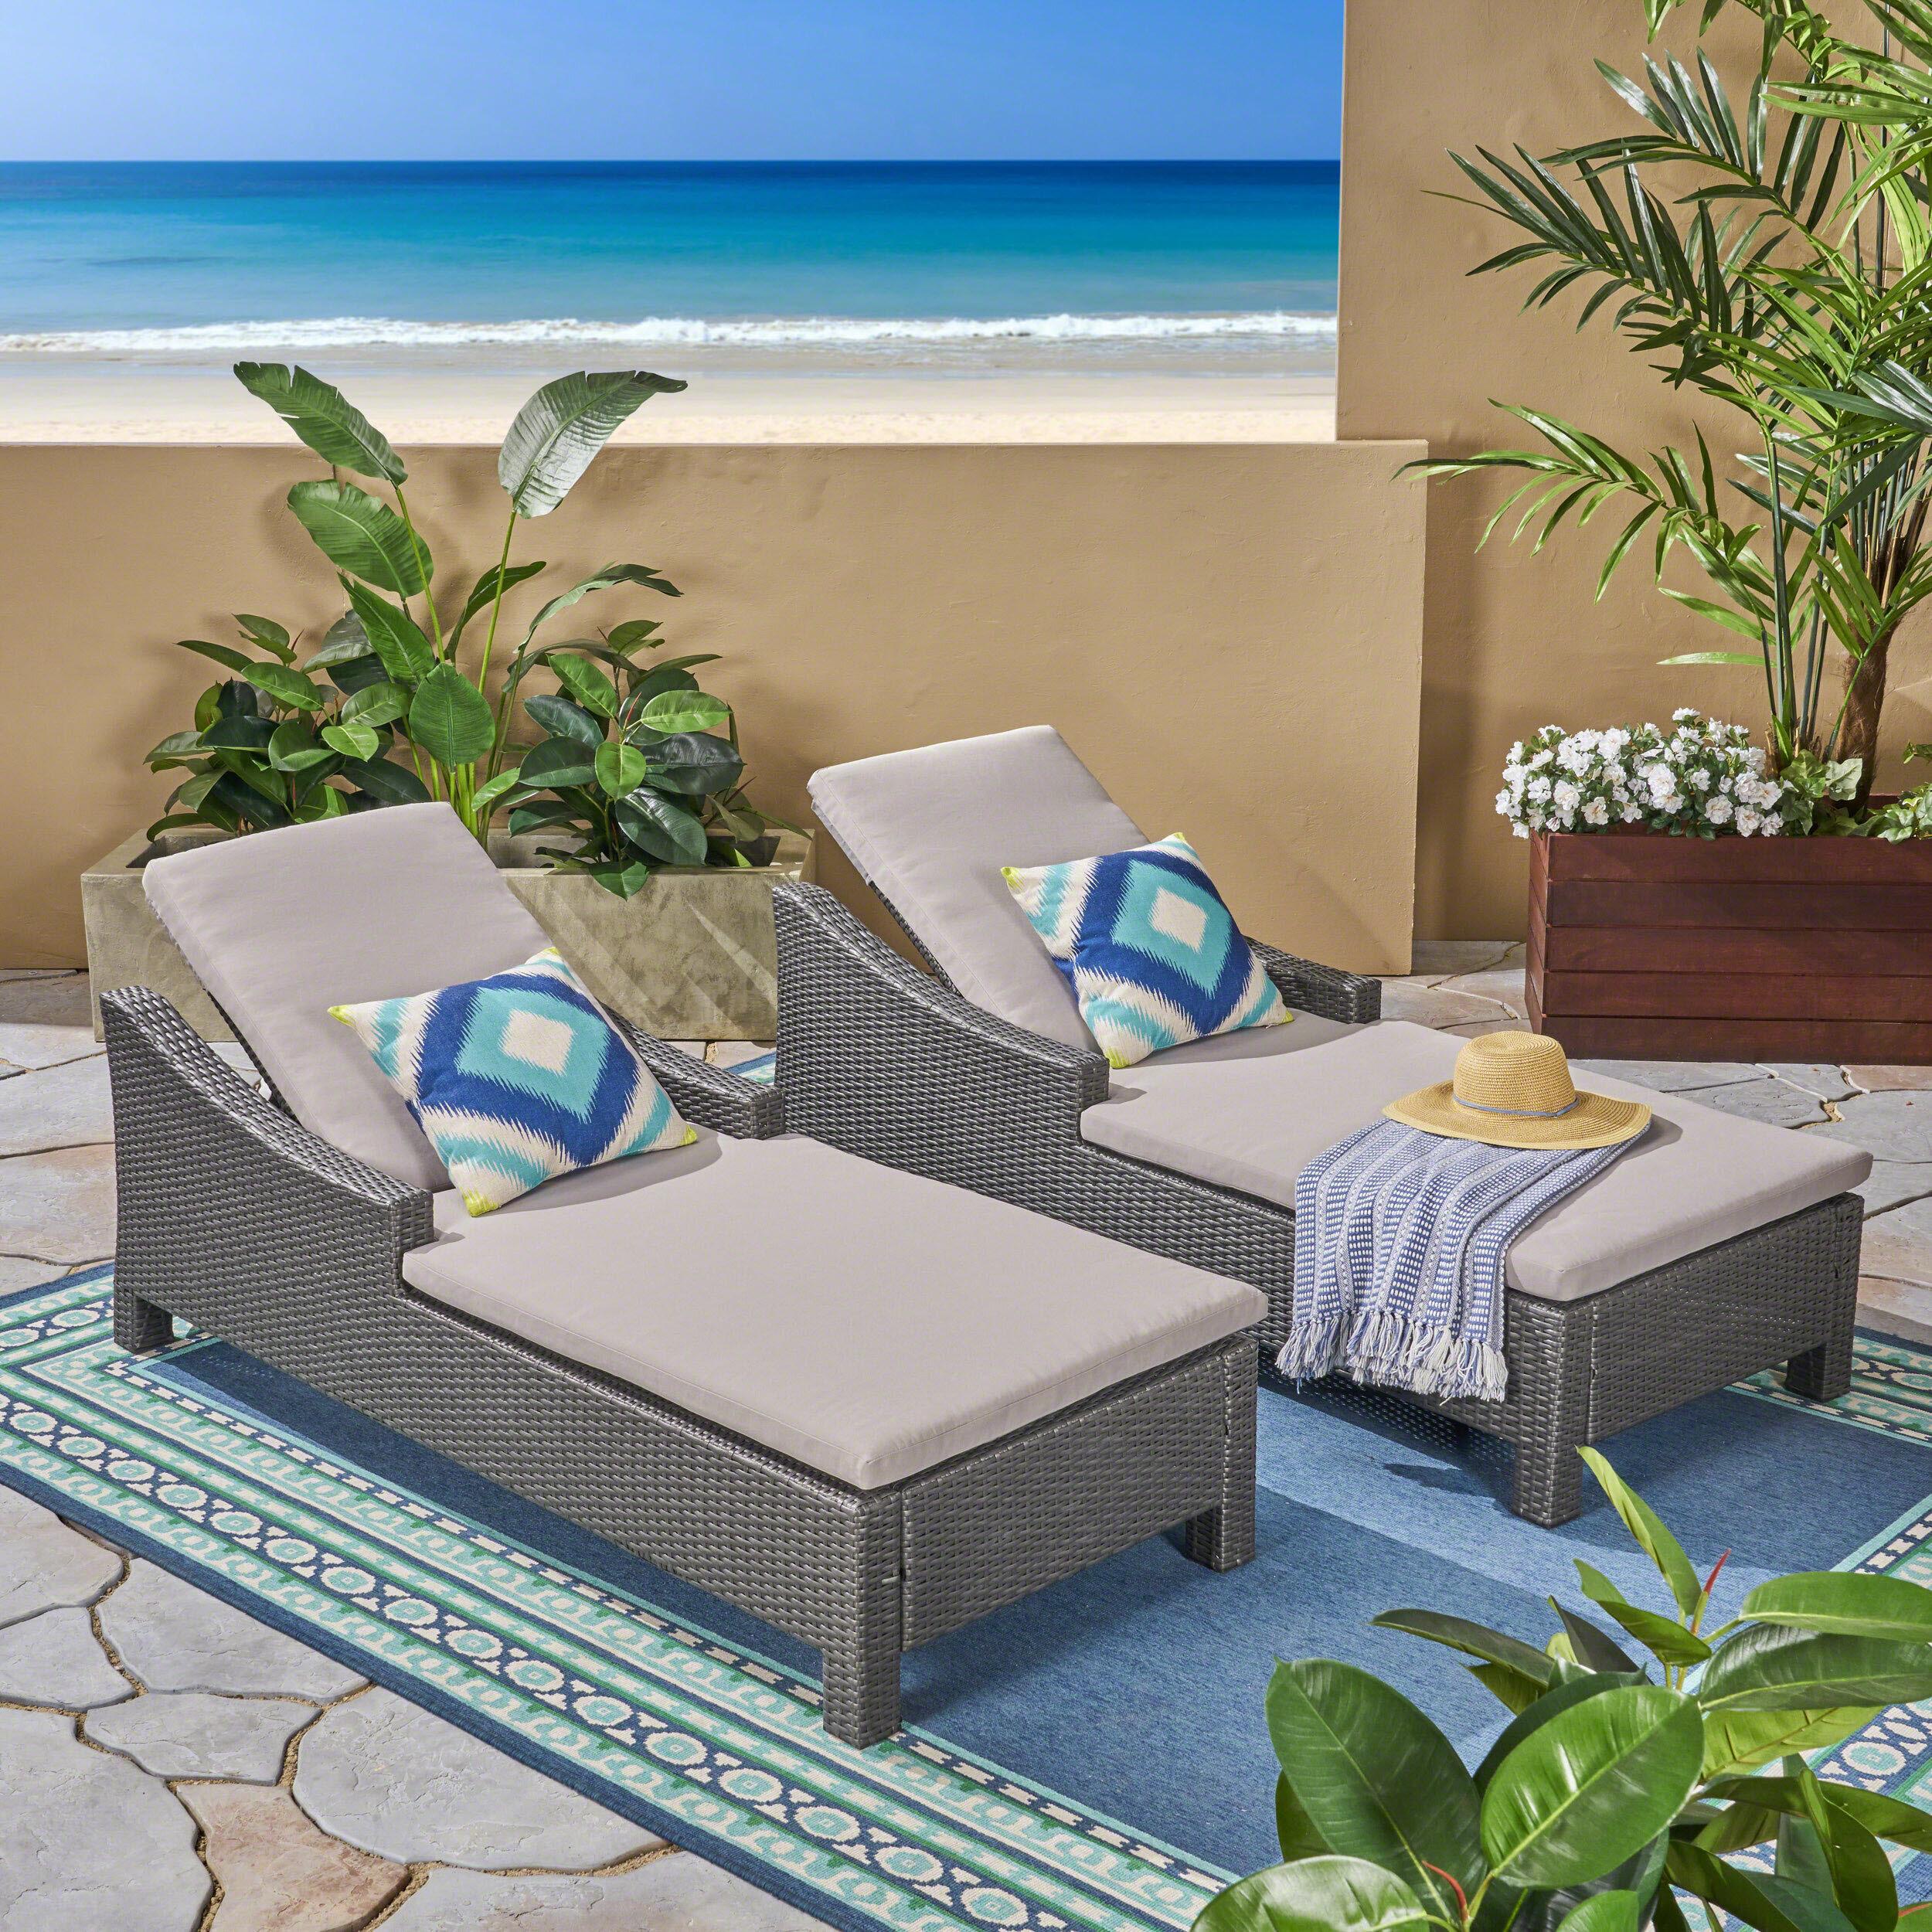 Phenomenal Portola Outdoor Reclining Chaise Lounge With Cushion Creativecarmelina Interior Chair Design Creativecarmelinacom